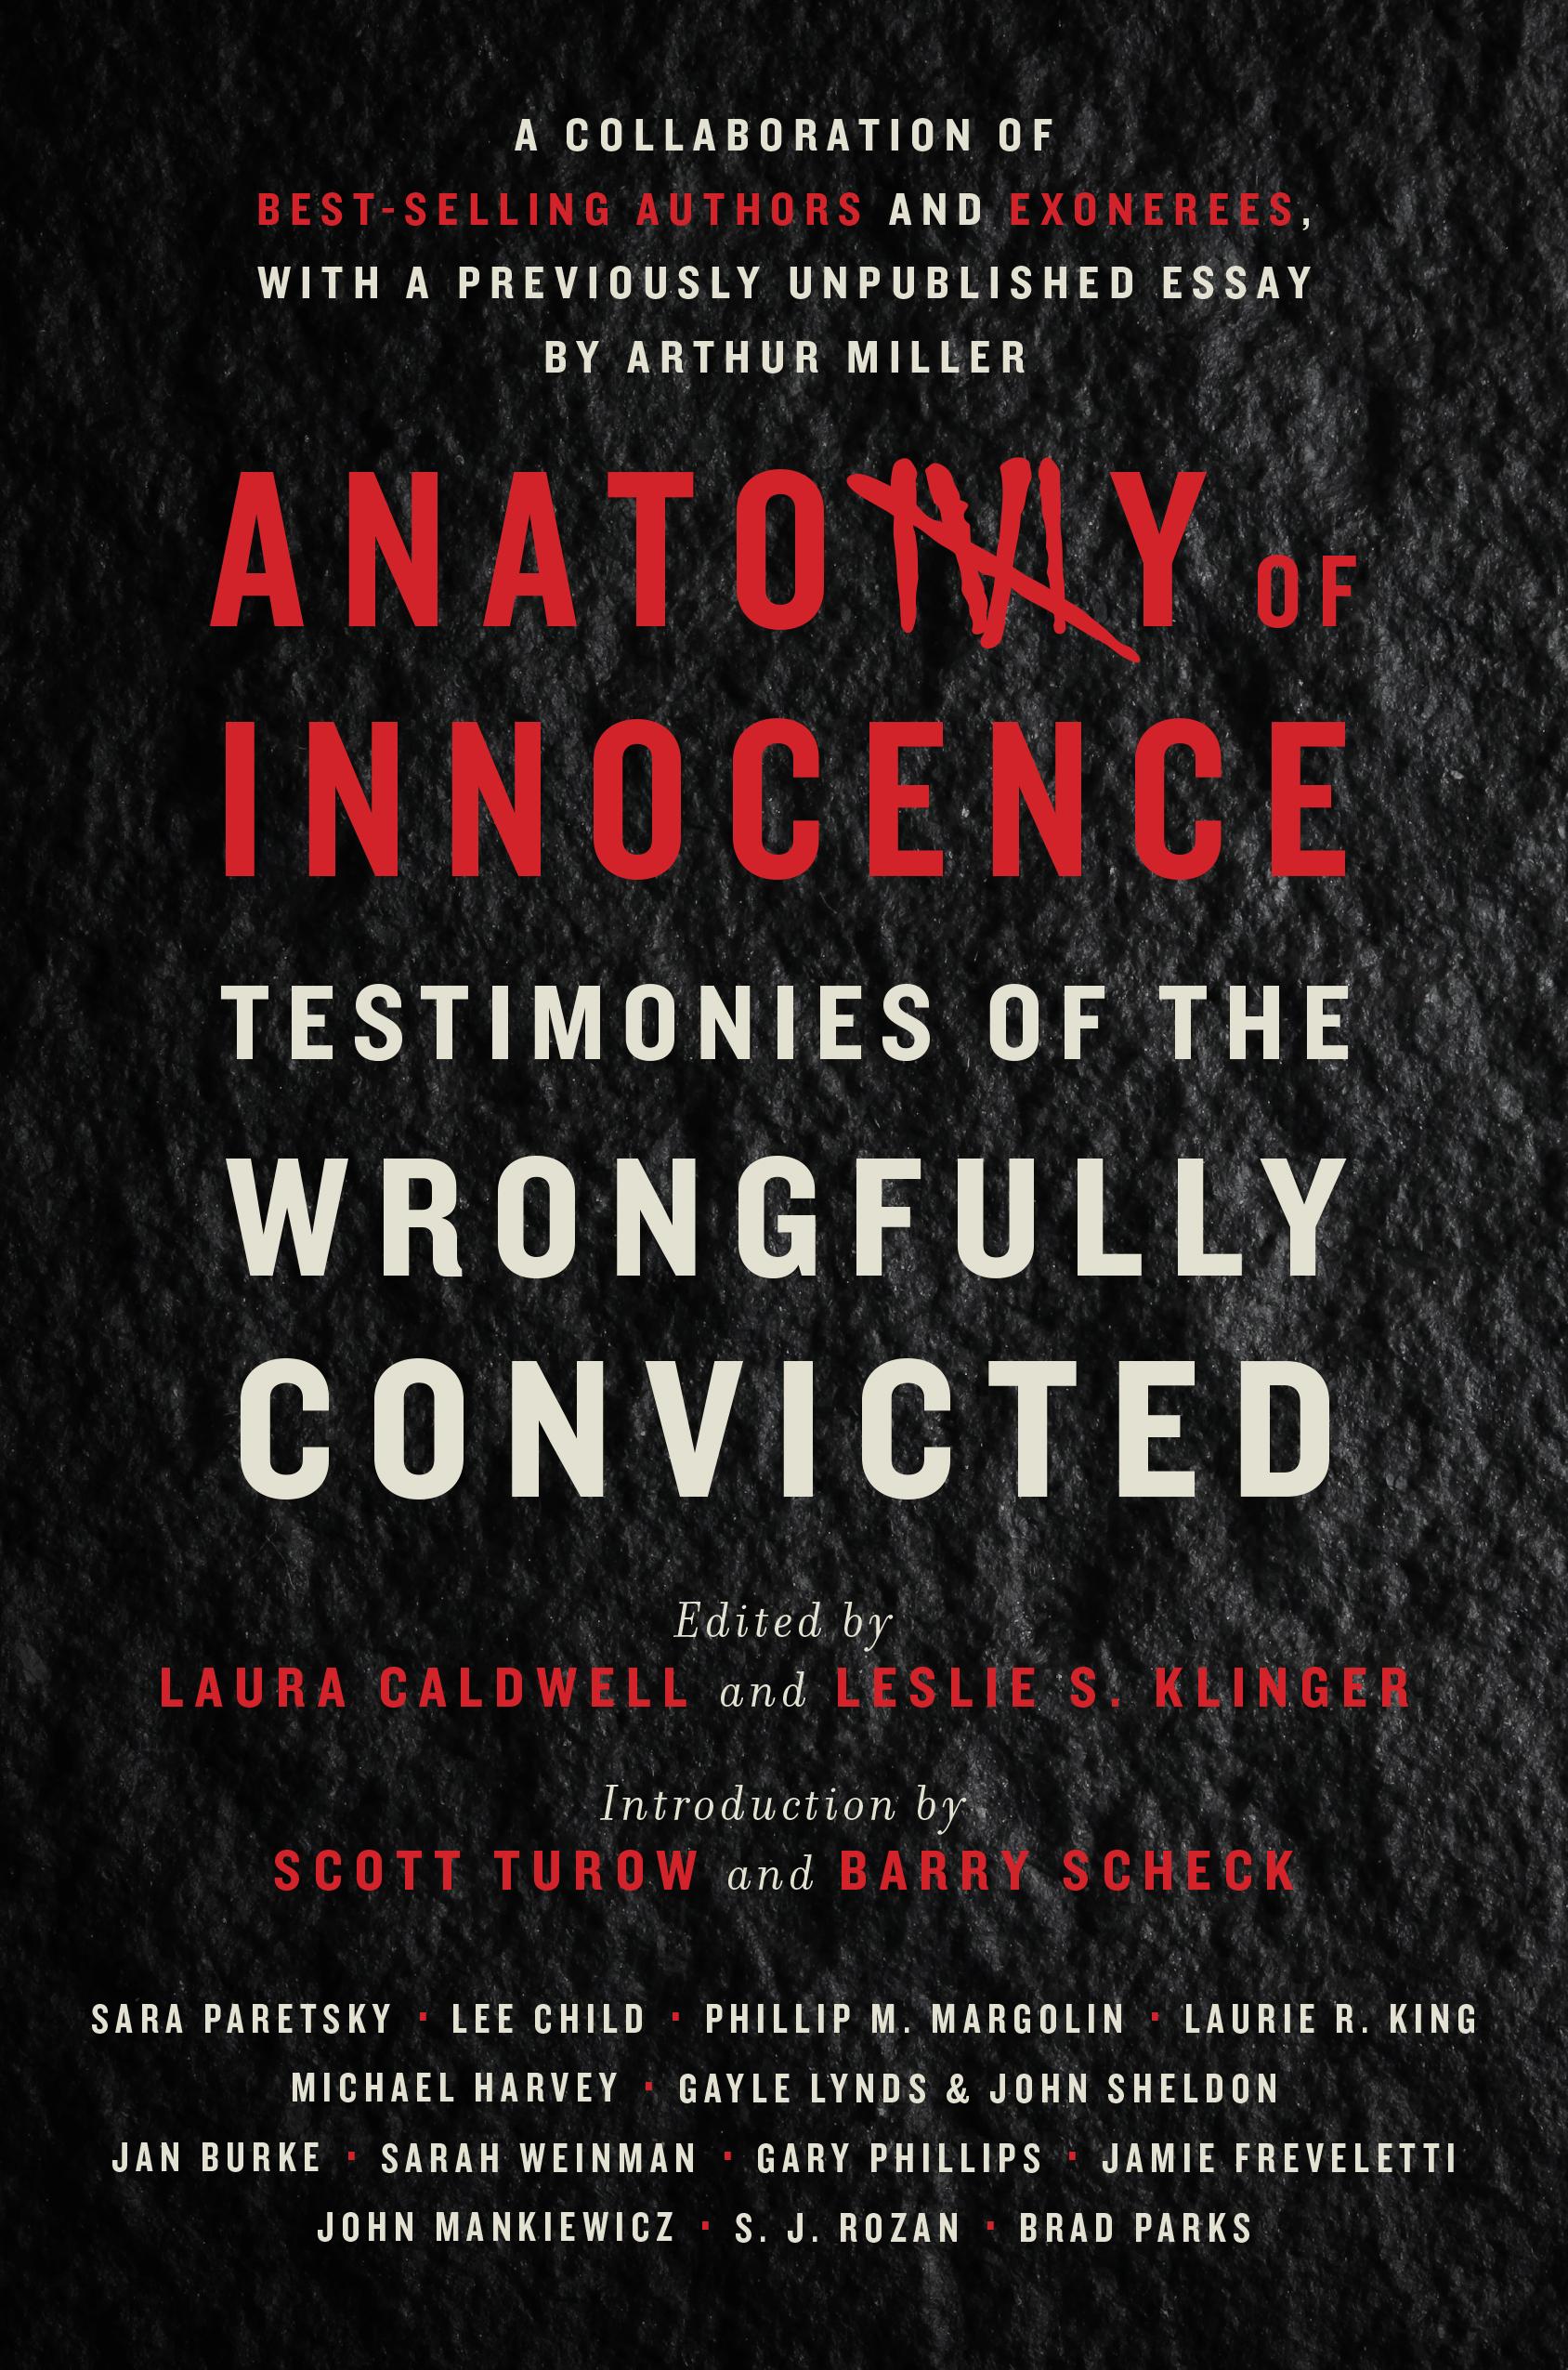 Anatomy of Innocence